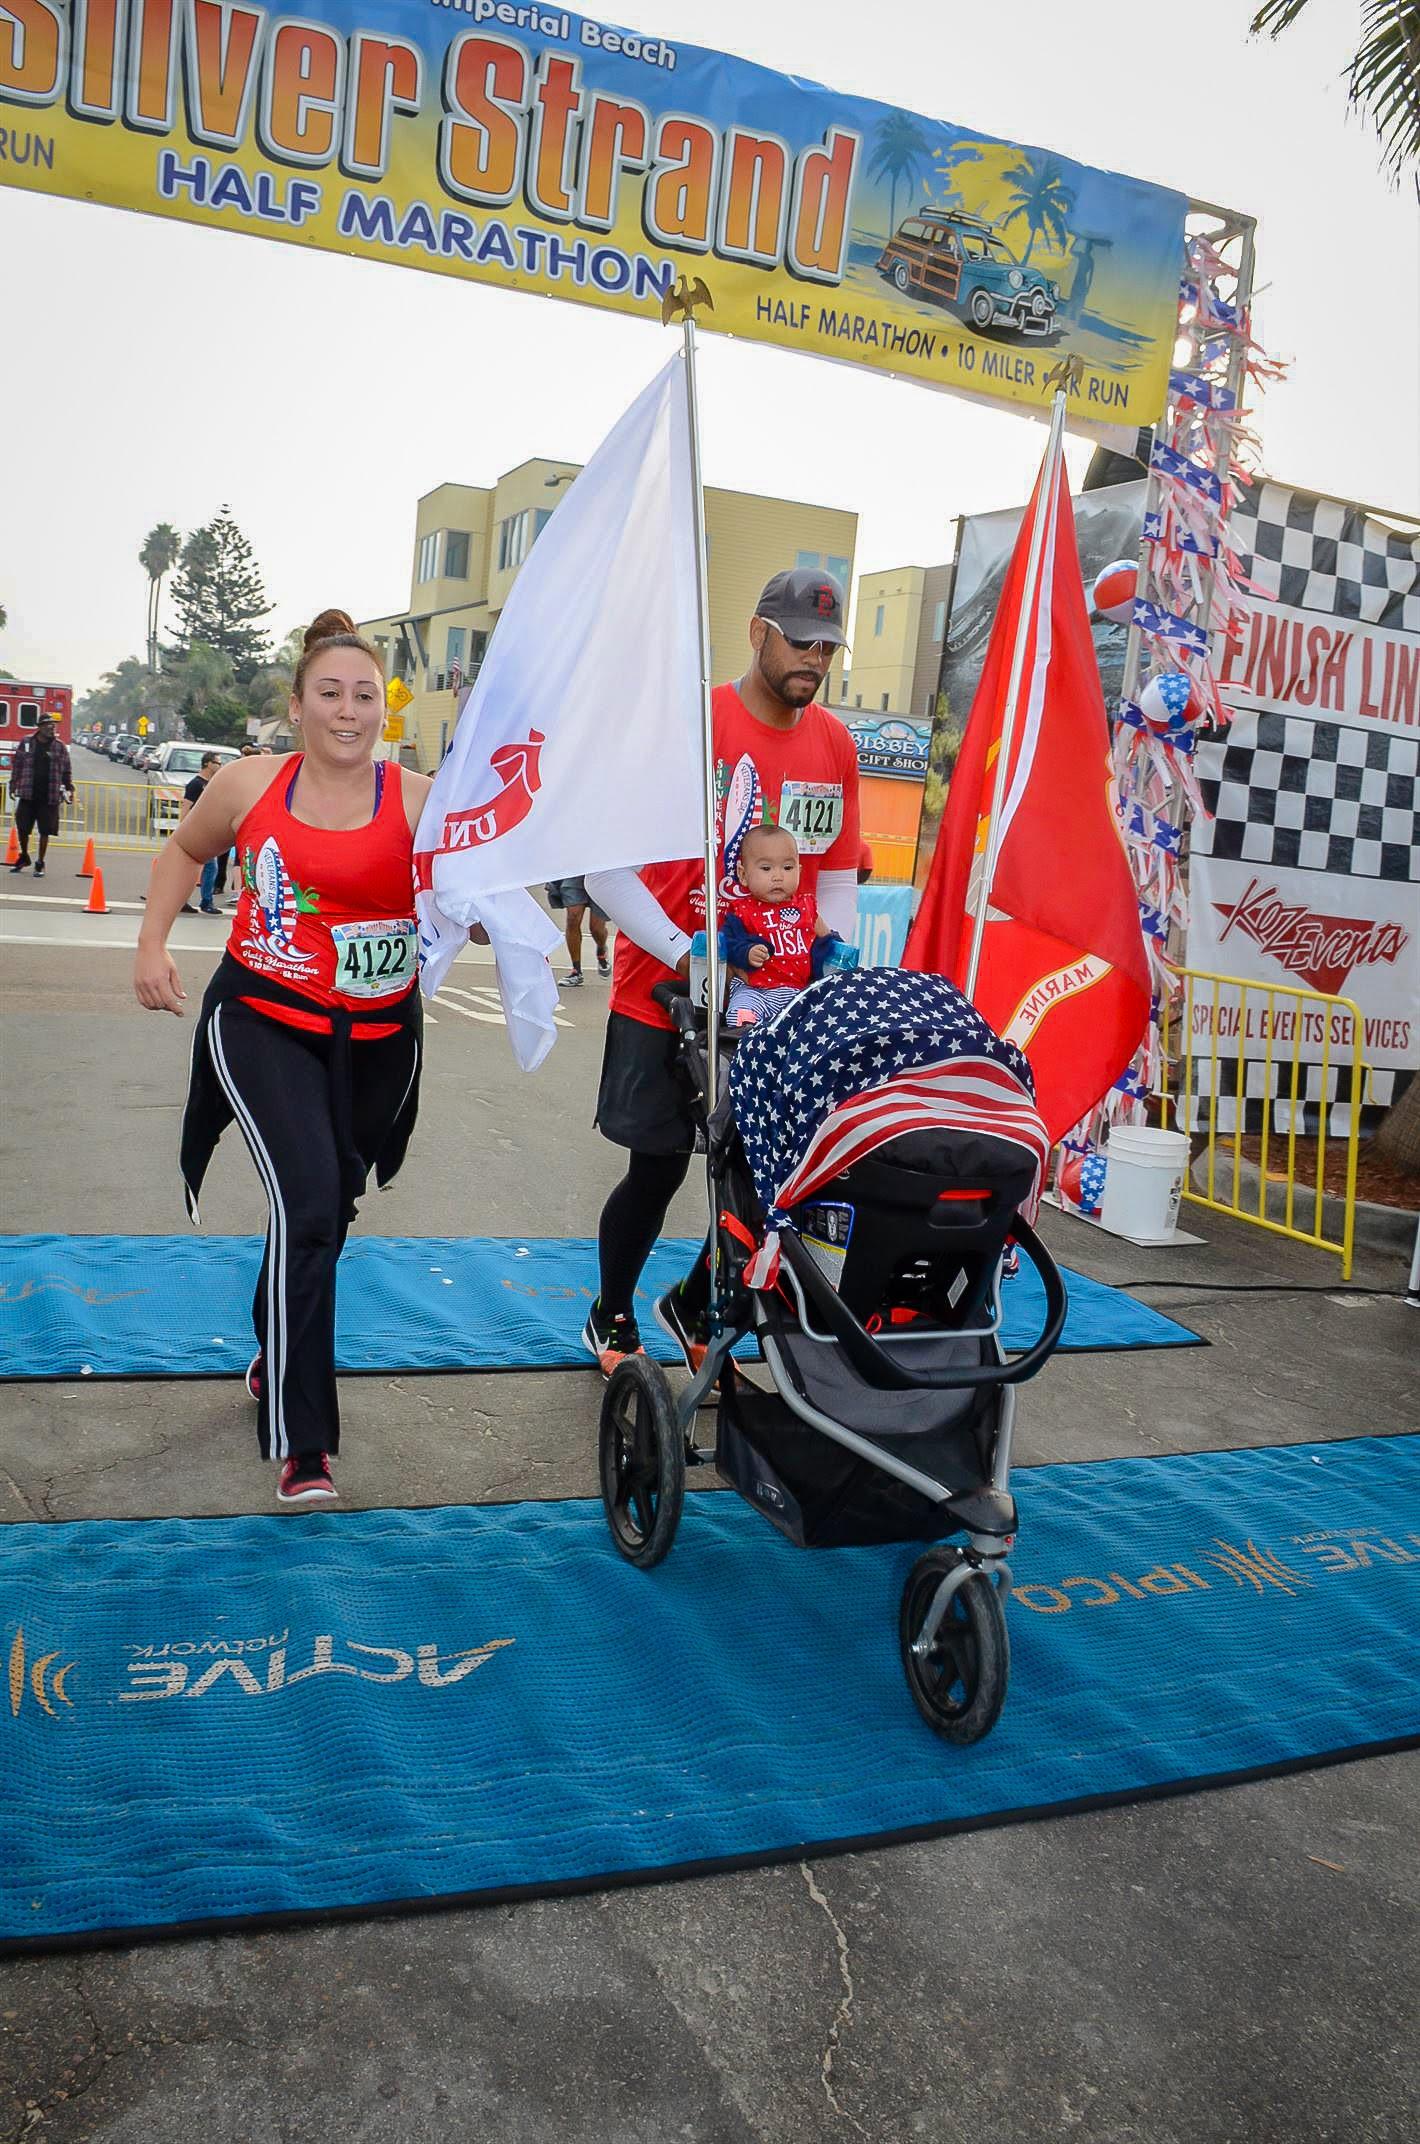 silver strand half marathon 2017-132.jpg